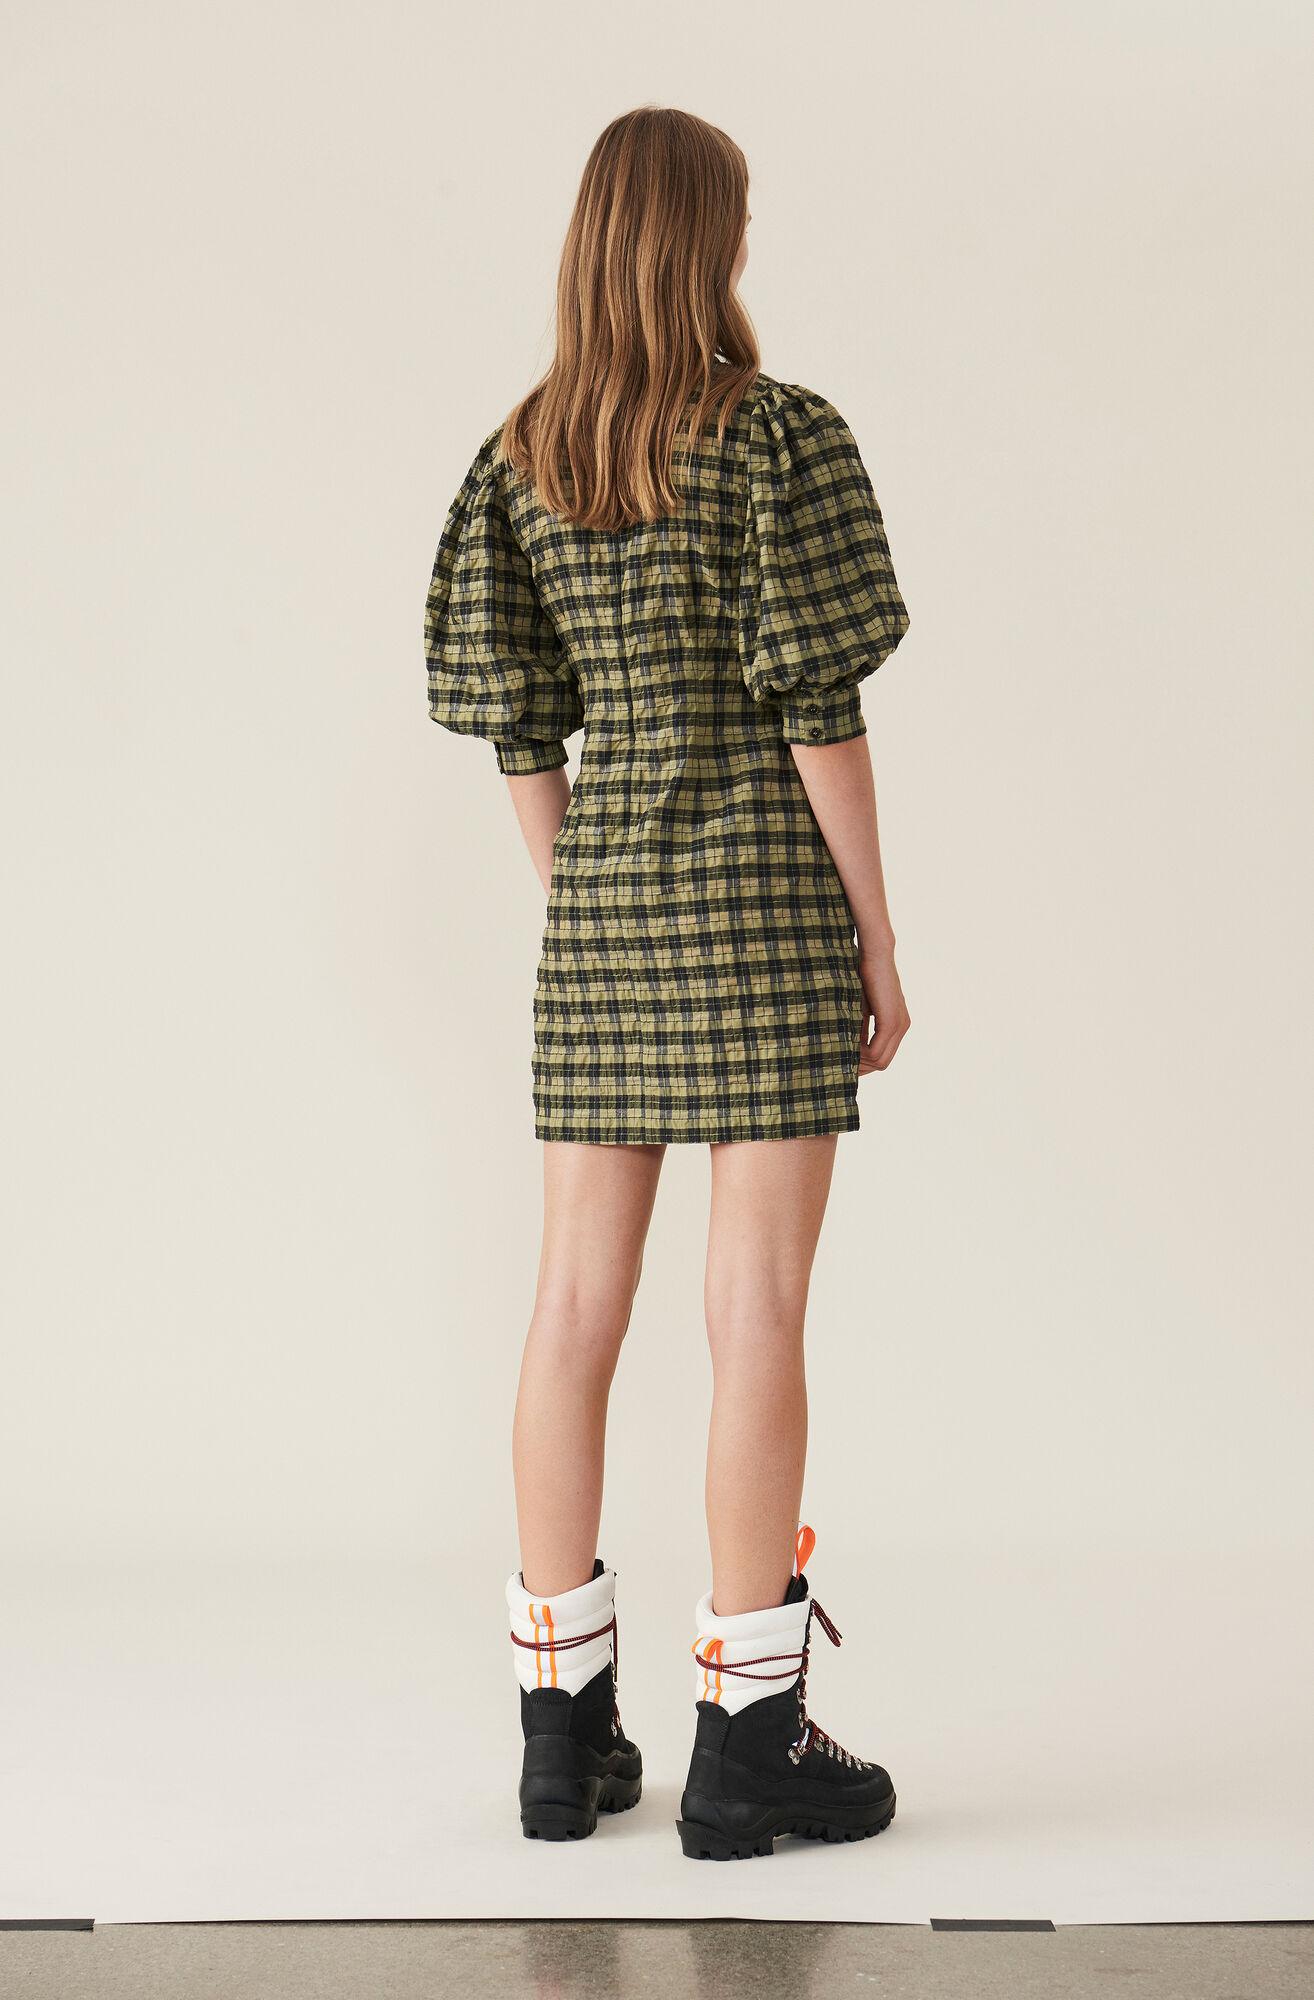 06e010a5aaf2c GANNI Seersucker Check Mini Dress ( 170.00 GBP )